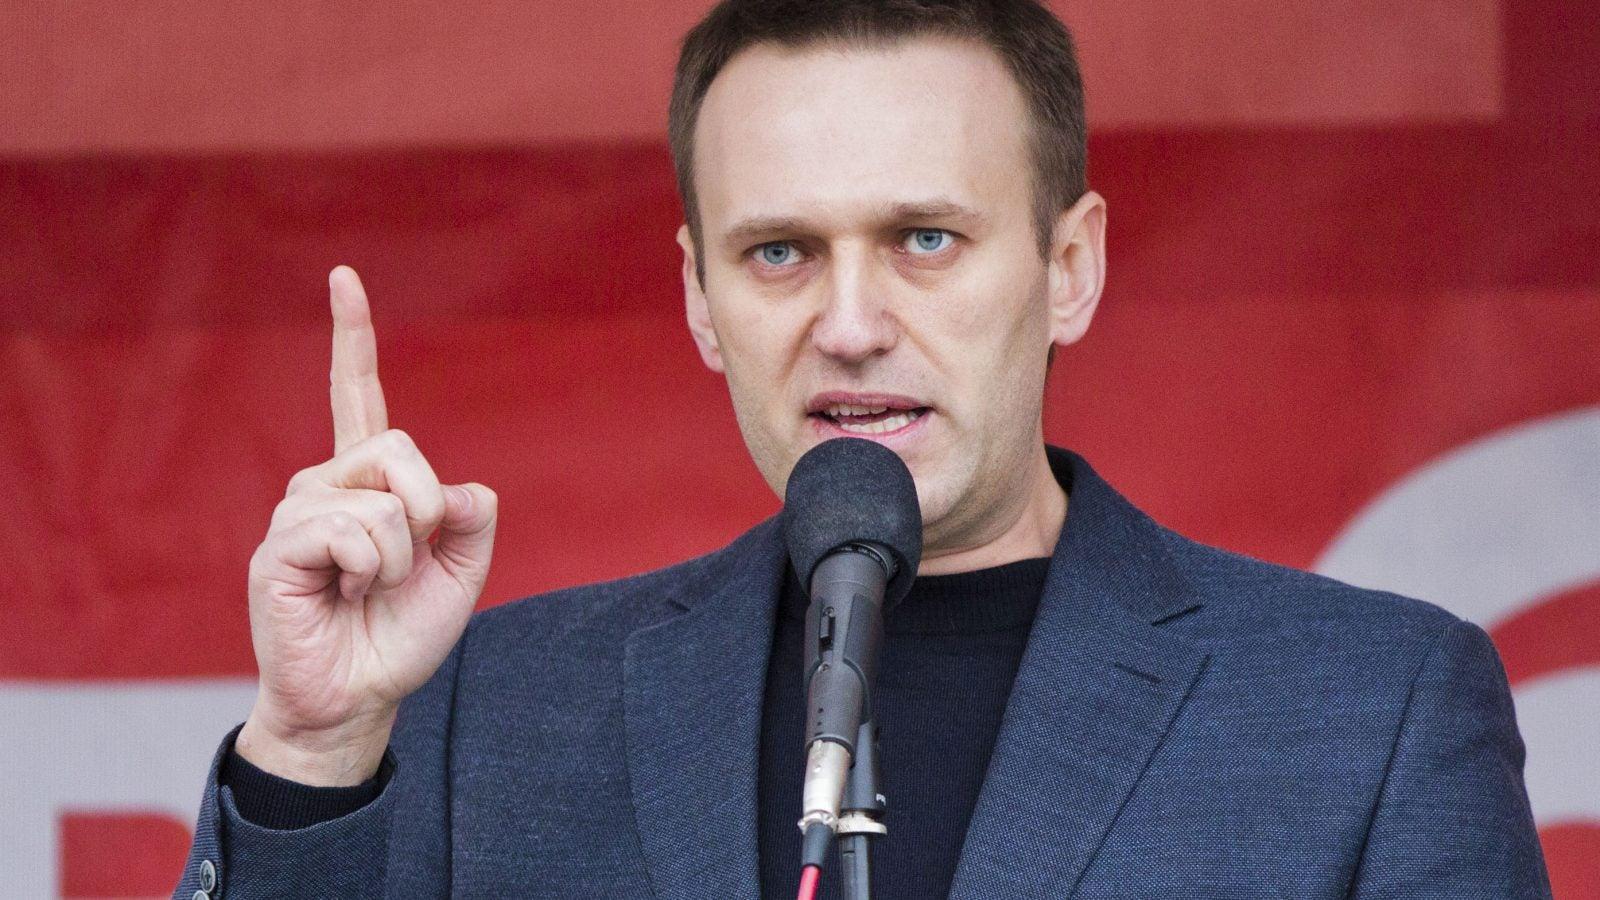 Alexei Navalny Speaking at Event